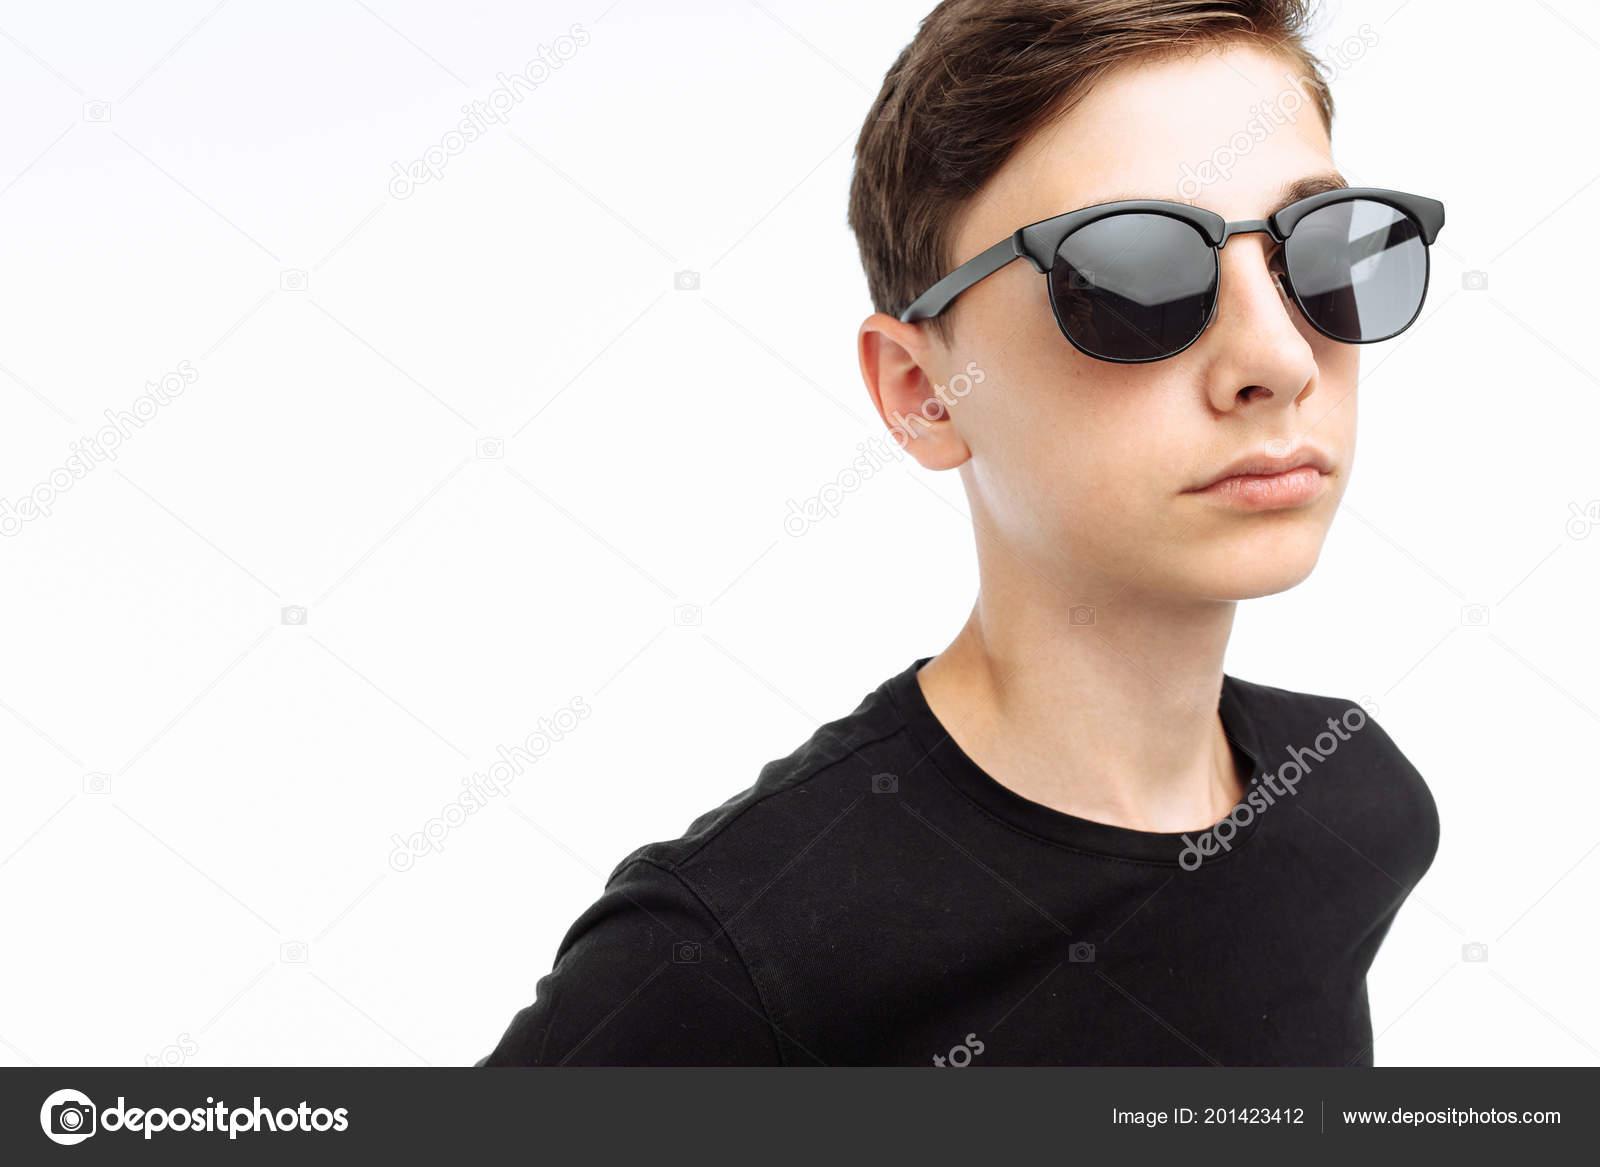 ef81305d390 Portrait Stylish Teenager Guy Glasses Black Shirt Posing Studio White —  Stock Photo